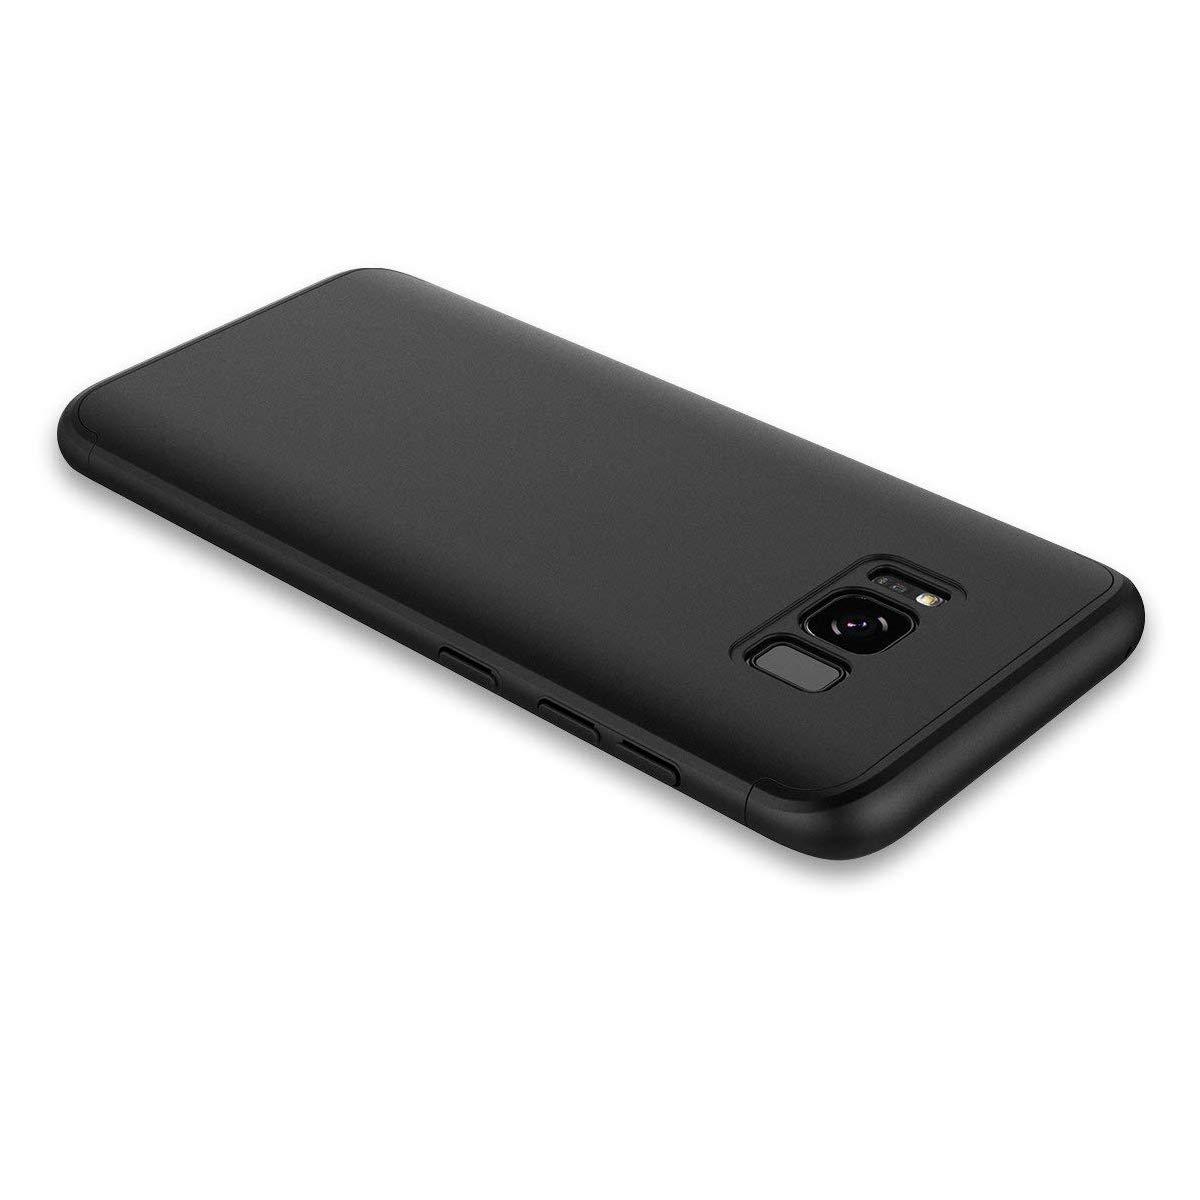 Hülle kompatibel Samsung Galaxy S8, Ultra Dünn PC Case 3-in-1 Hardcase Stoßfest Schutzhülle Anti-Fingerabdruck Cover Schale compatibel Samsung Galaxy S8 Plus